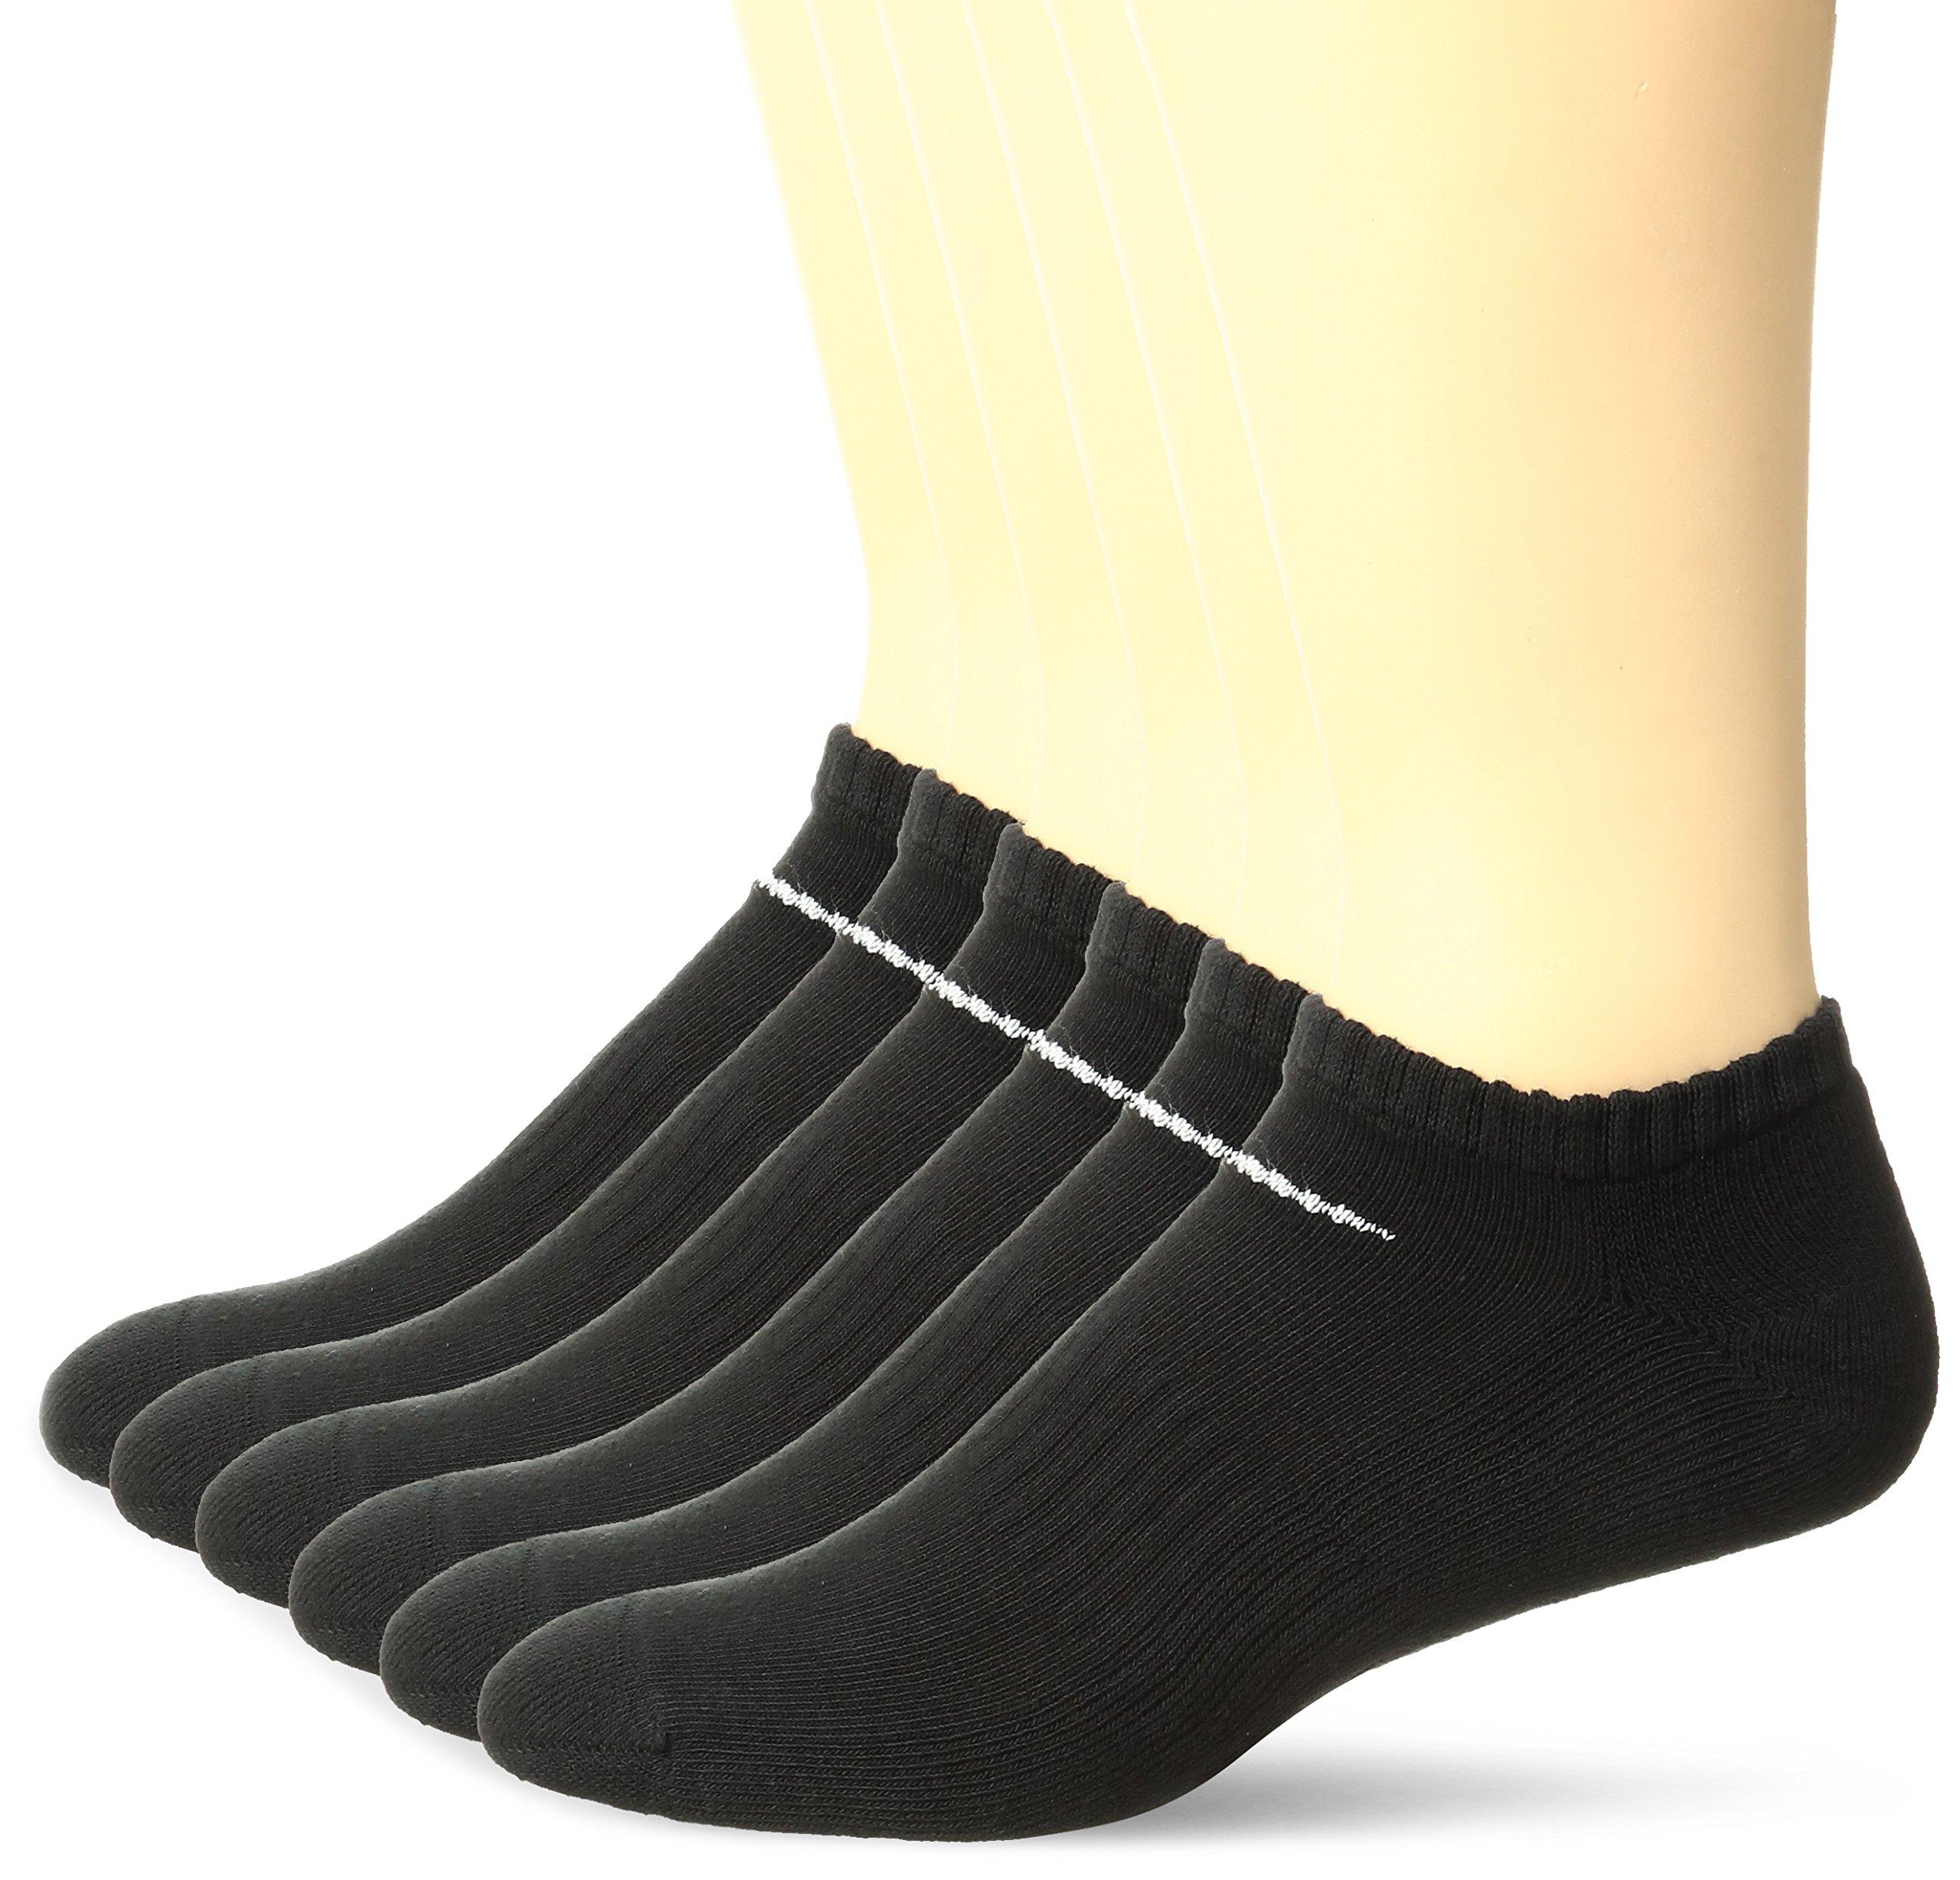 NIKE Unisex Performance Cushion No-Show Socks with Bag (6 Pairs), Black/White, Large by Nike